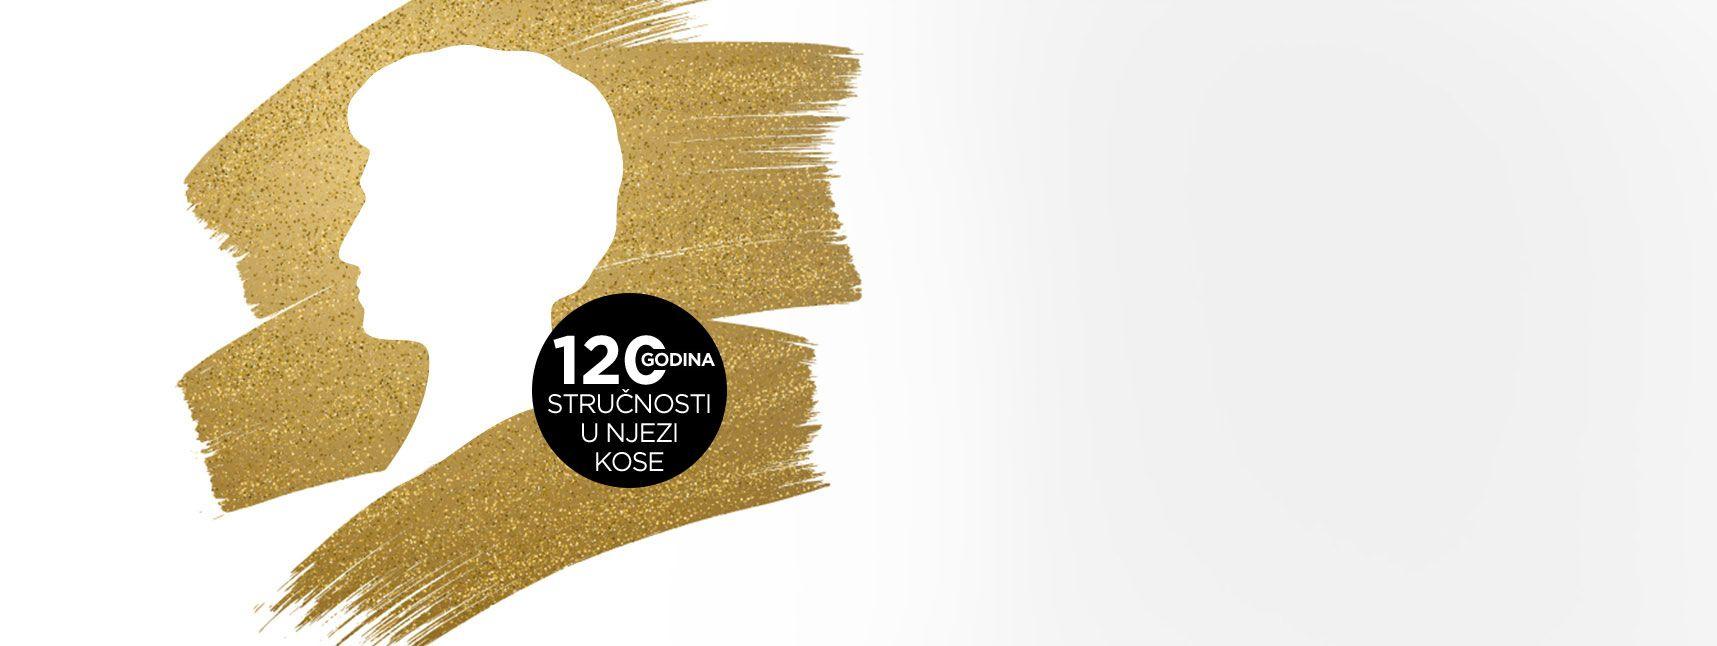 120. godišnjica Schwarzkopfa